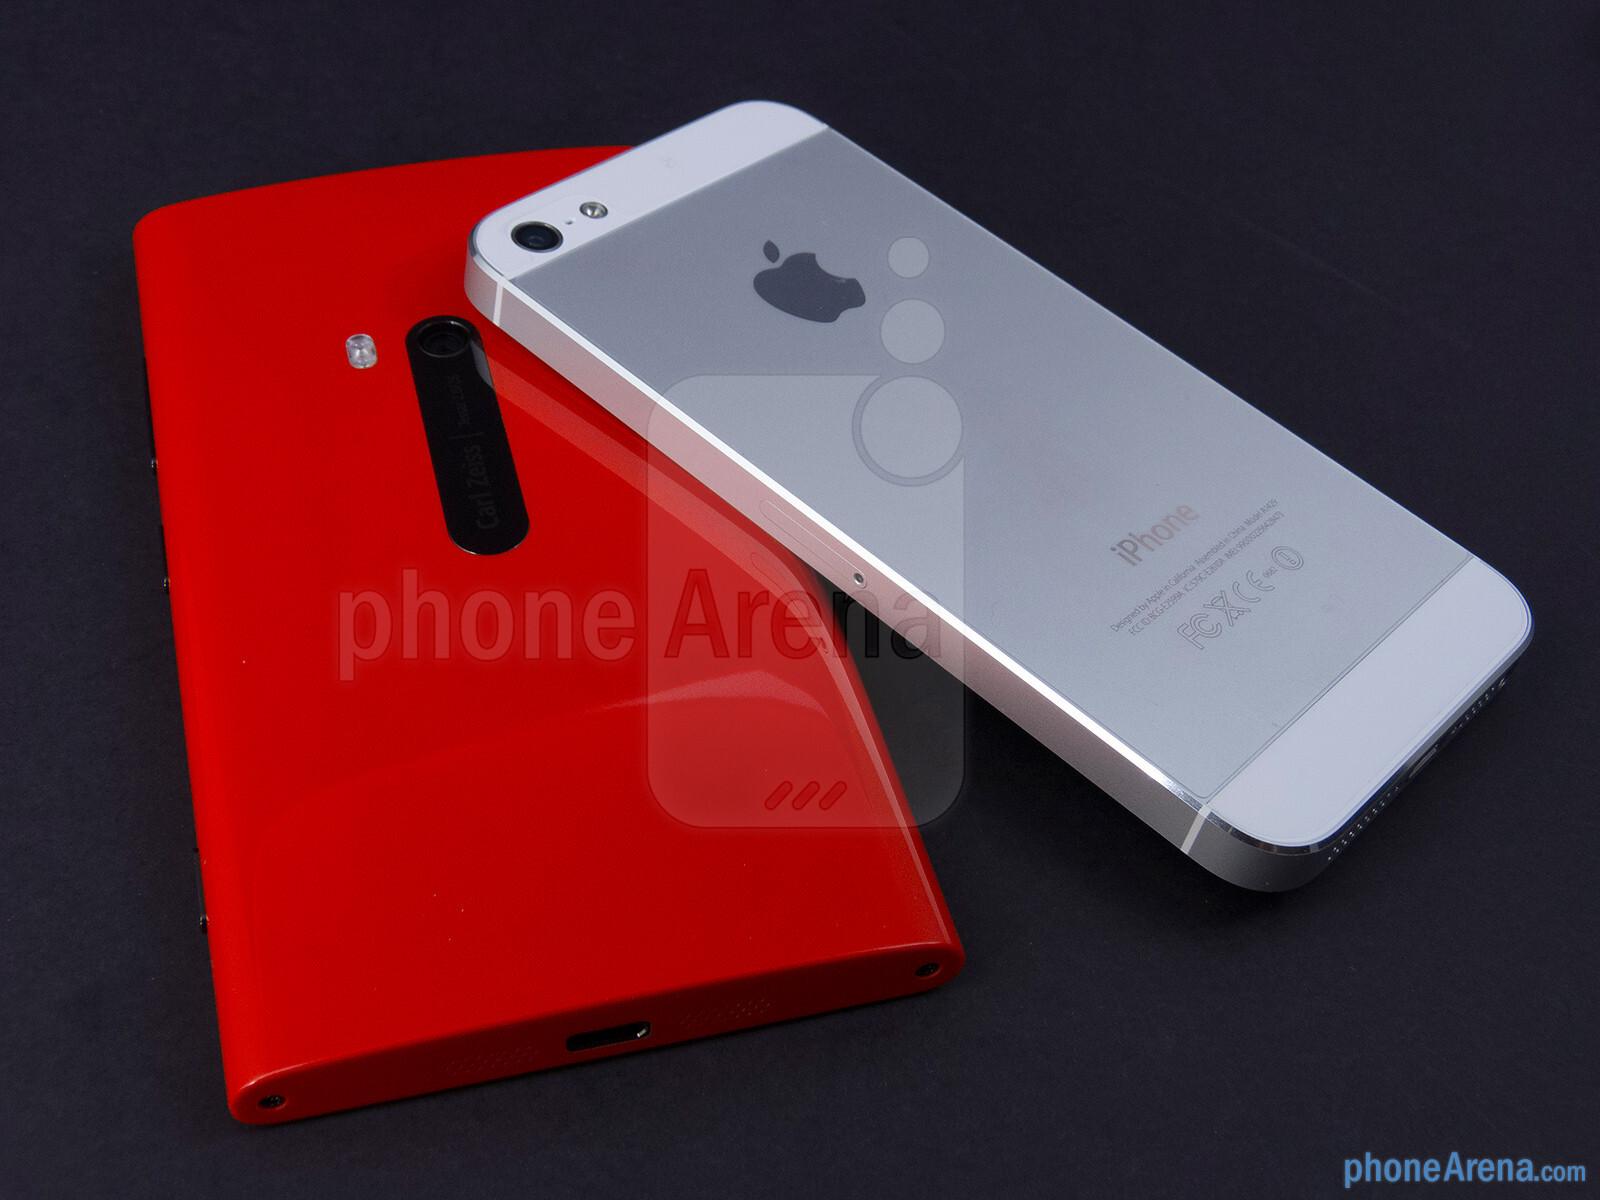 nokia lumia 920 vs apple iphone 5 phonearena. Black Bedroom Furniture Sets. Home Design Ideas